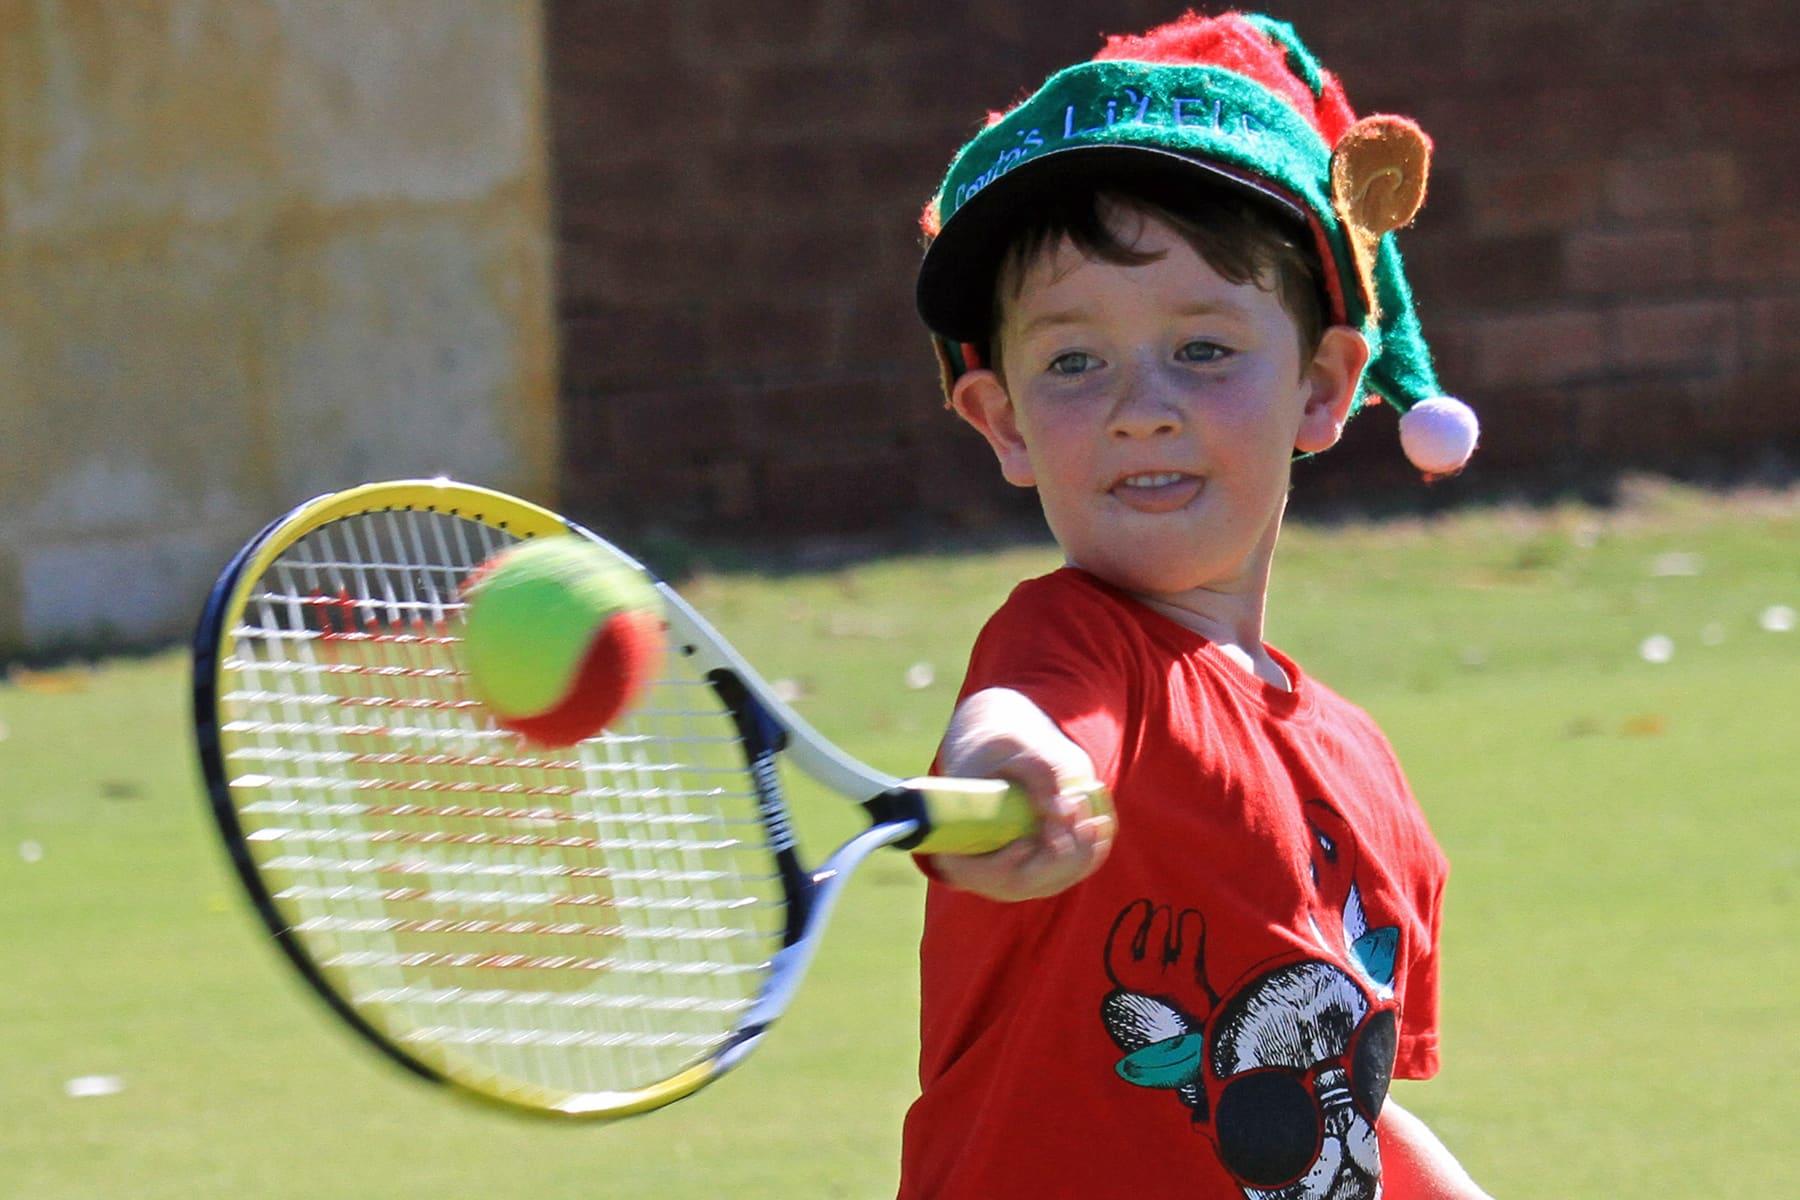 https://www.tennisexcellence.com.au/wp-content/uploads/2020/01/Programs_School-Holiday-Clinics.jpg